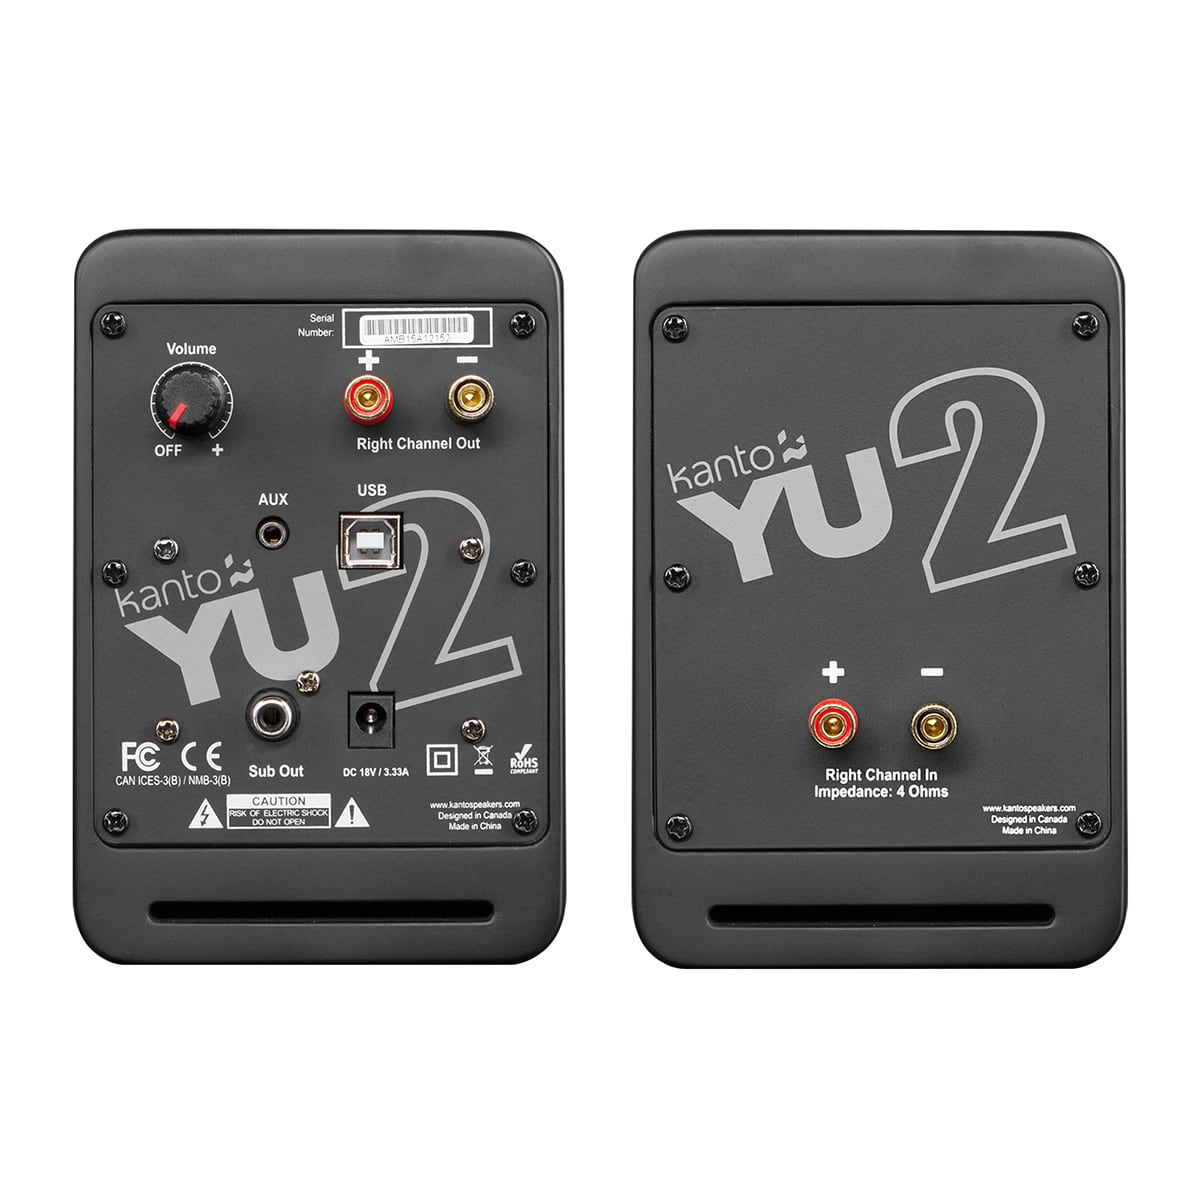 thumbnail 10 - Kanto YU2 Powered Desktop Speakers - Pair